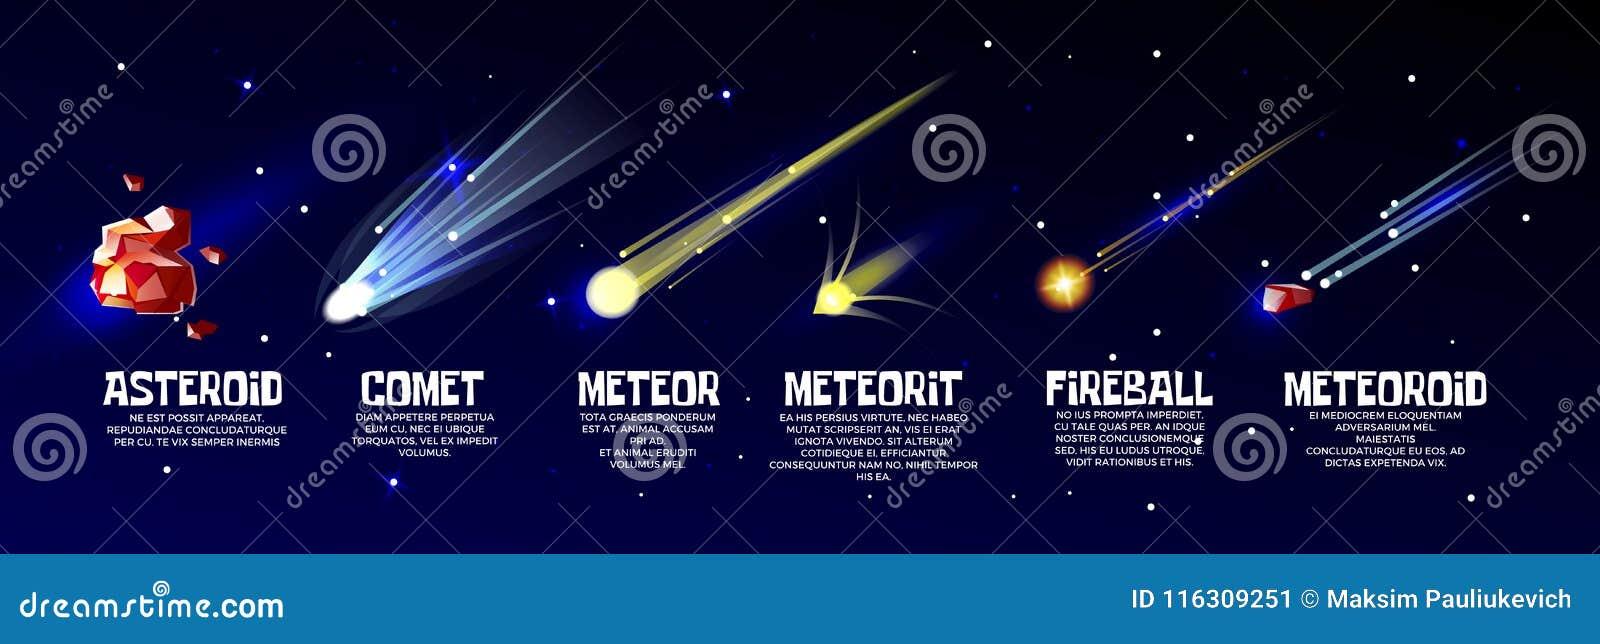 Meteorito de la historieta del vector, sistema del asteroide del cometa